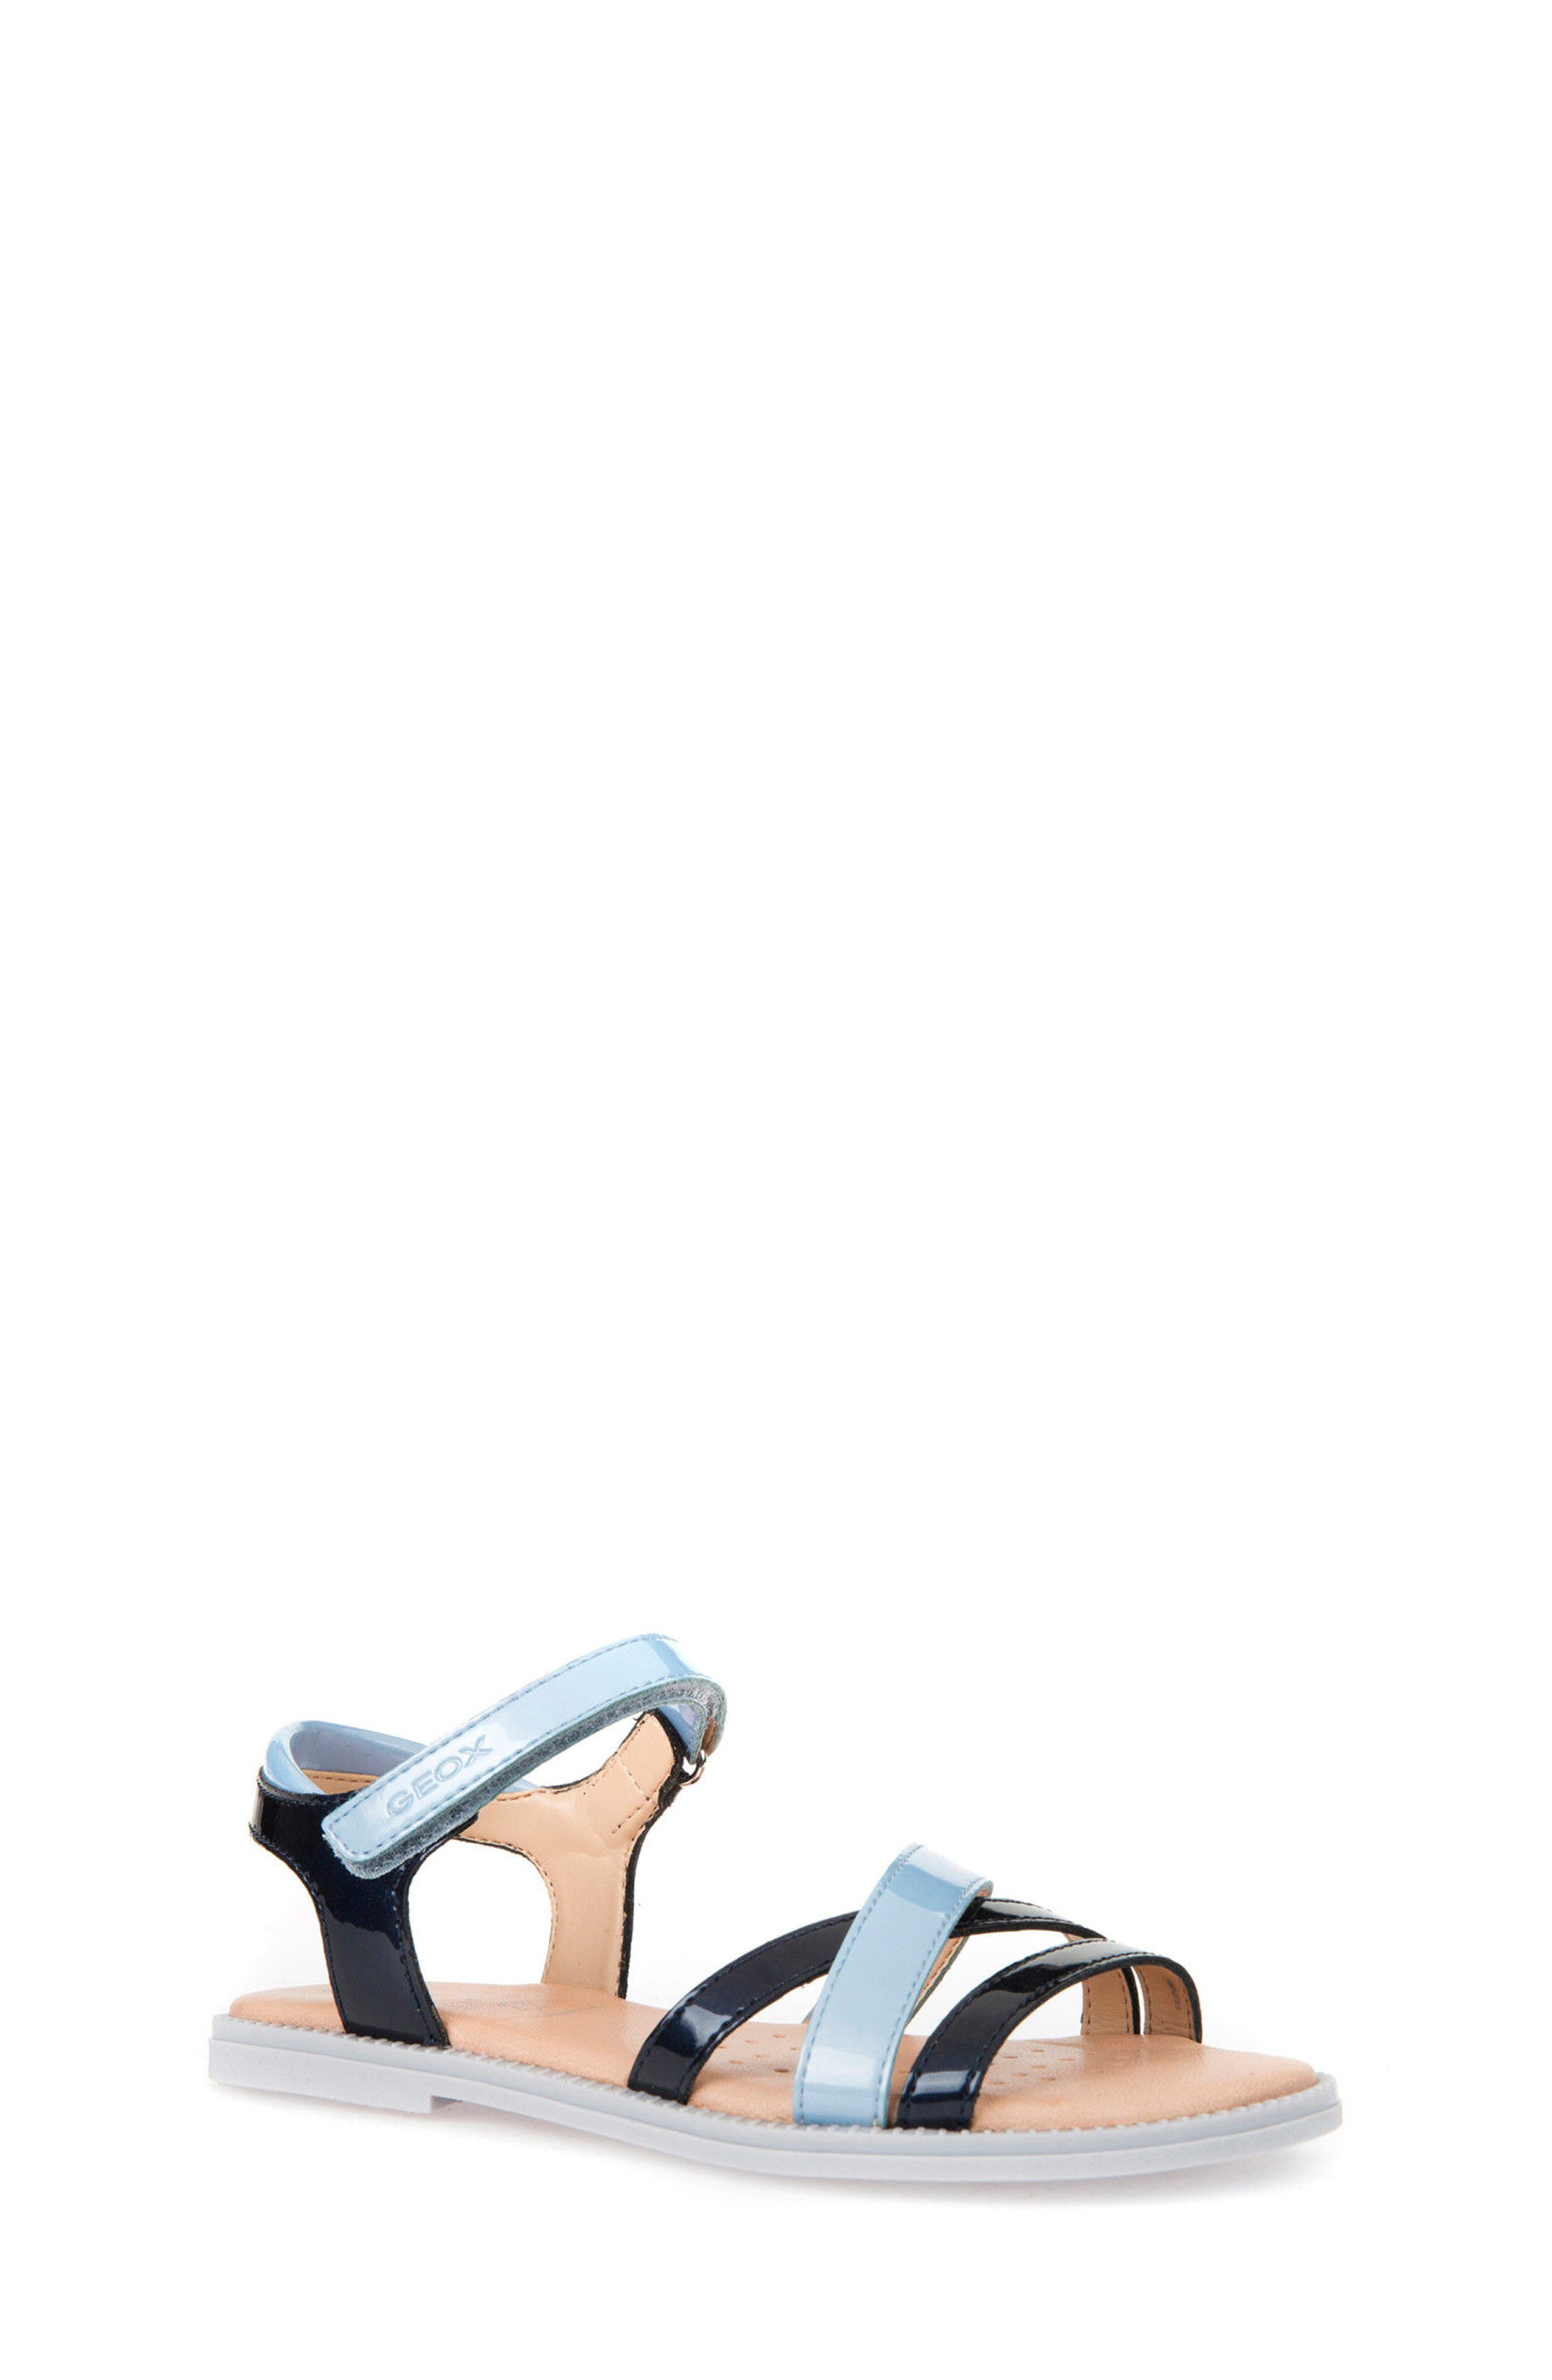 Karly Girl Sandal,                             Main thumbnail 1, color,                             420